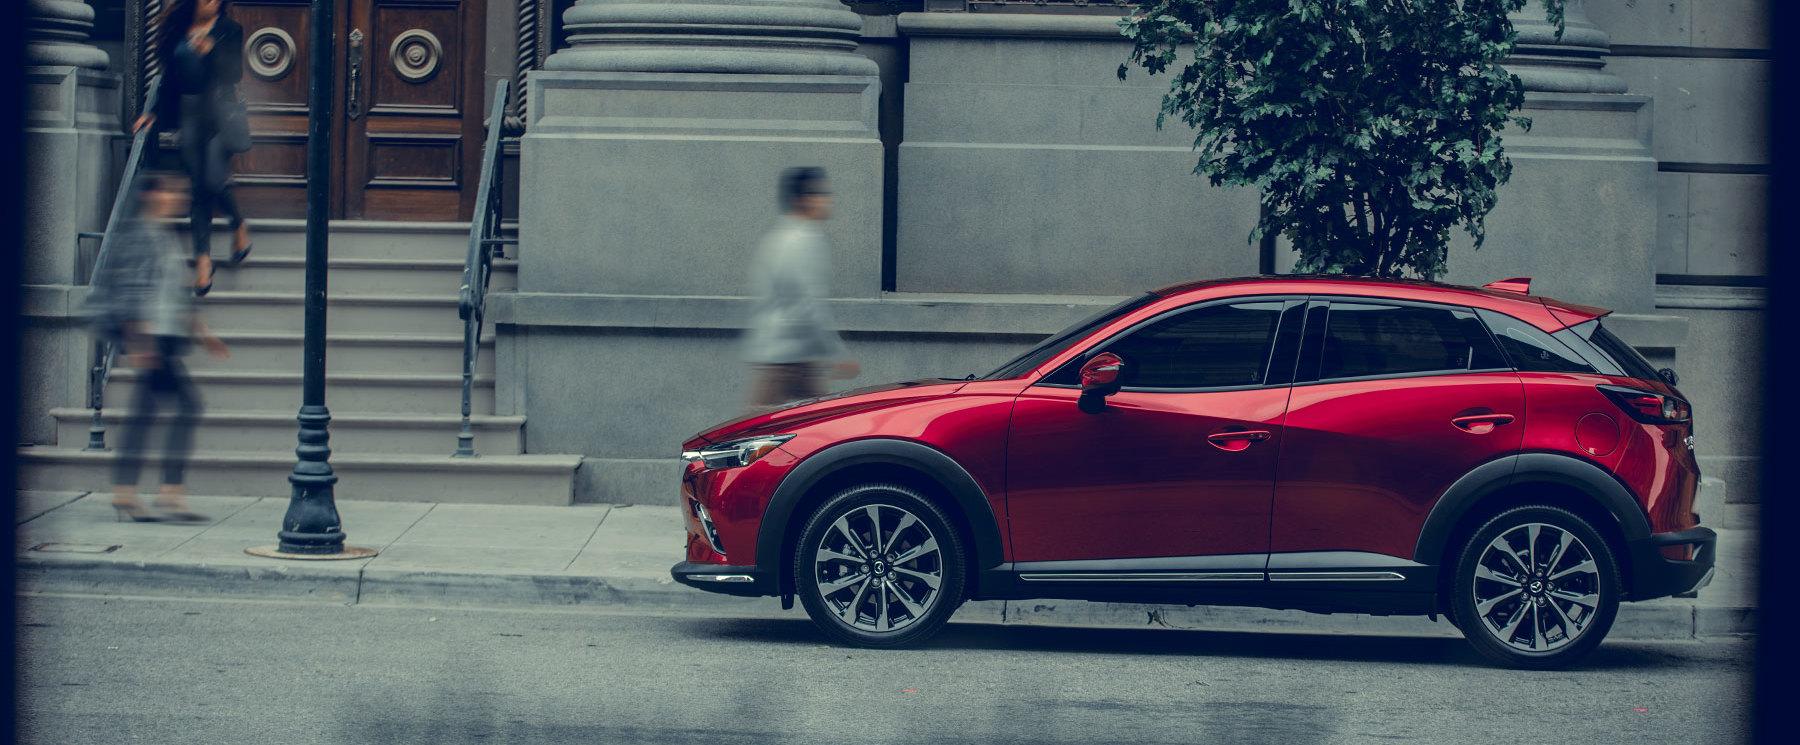 2019 Mazda CX-3 Financing near Boerne, TX